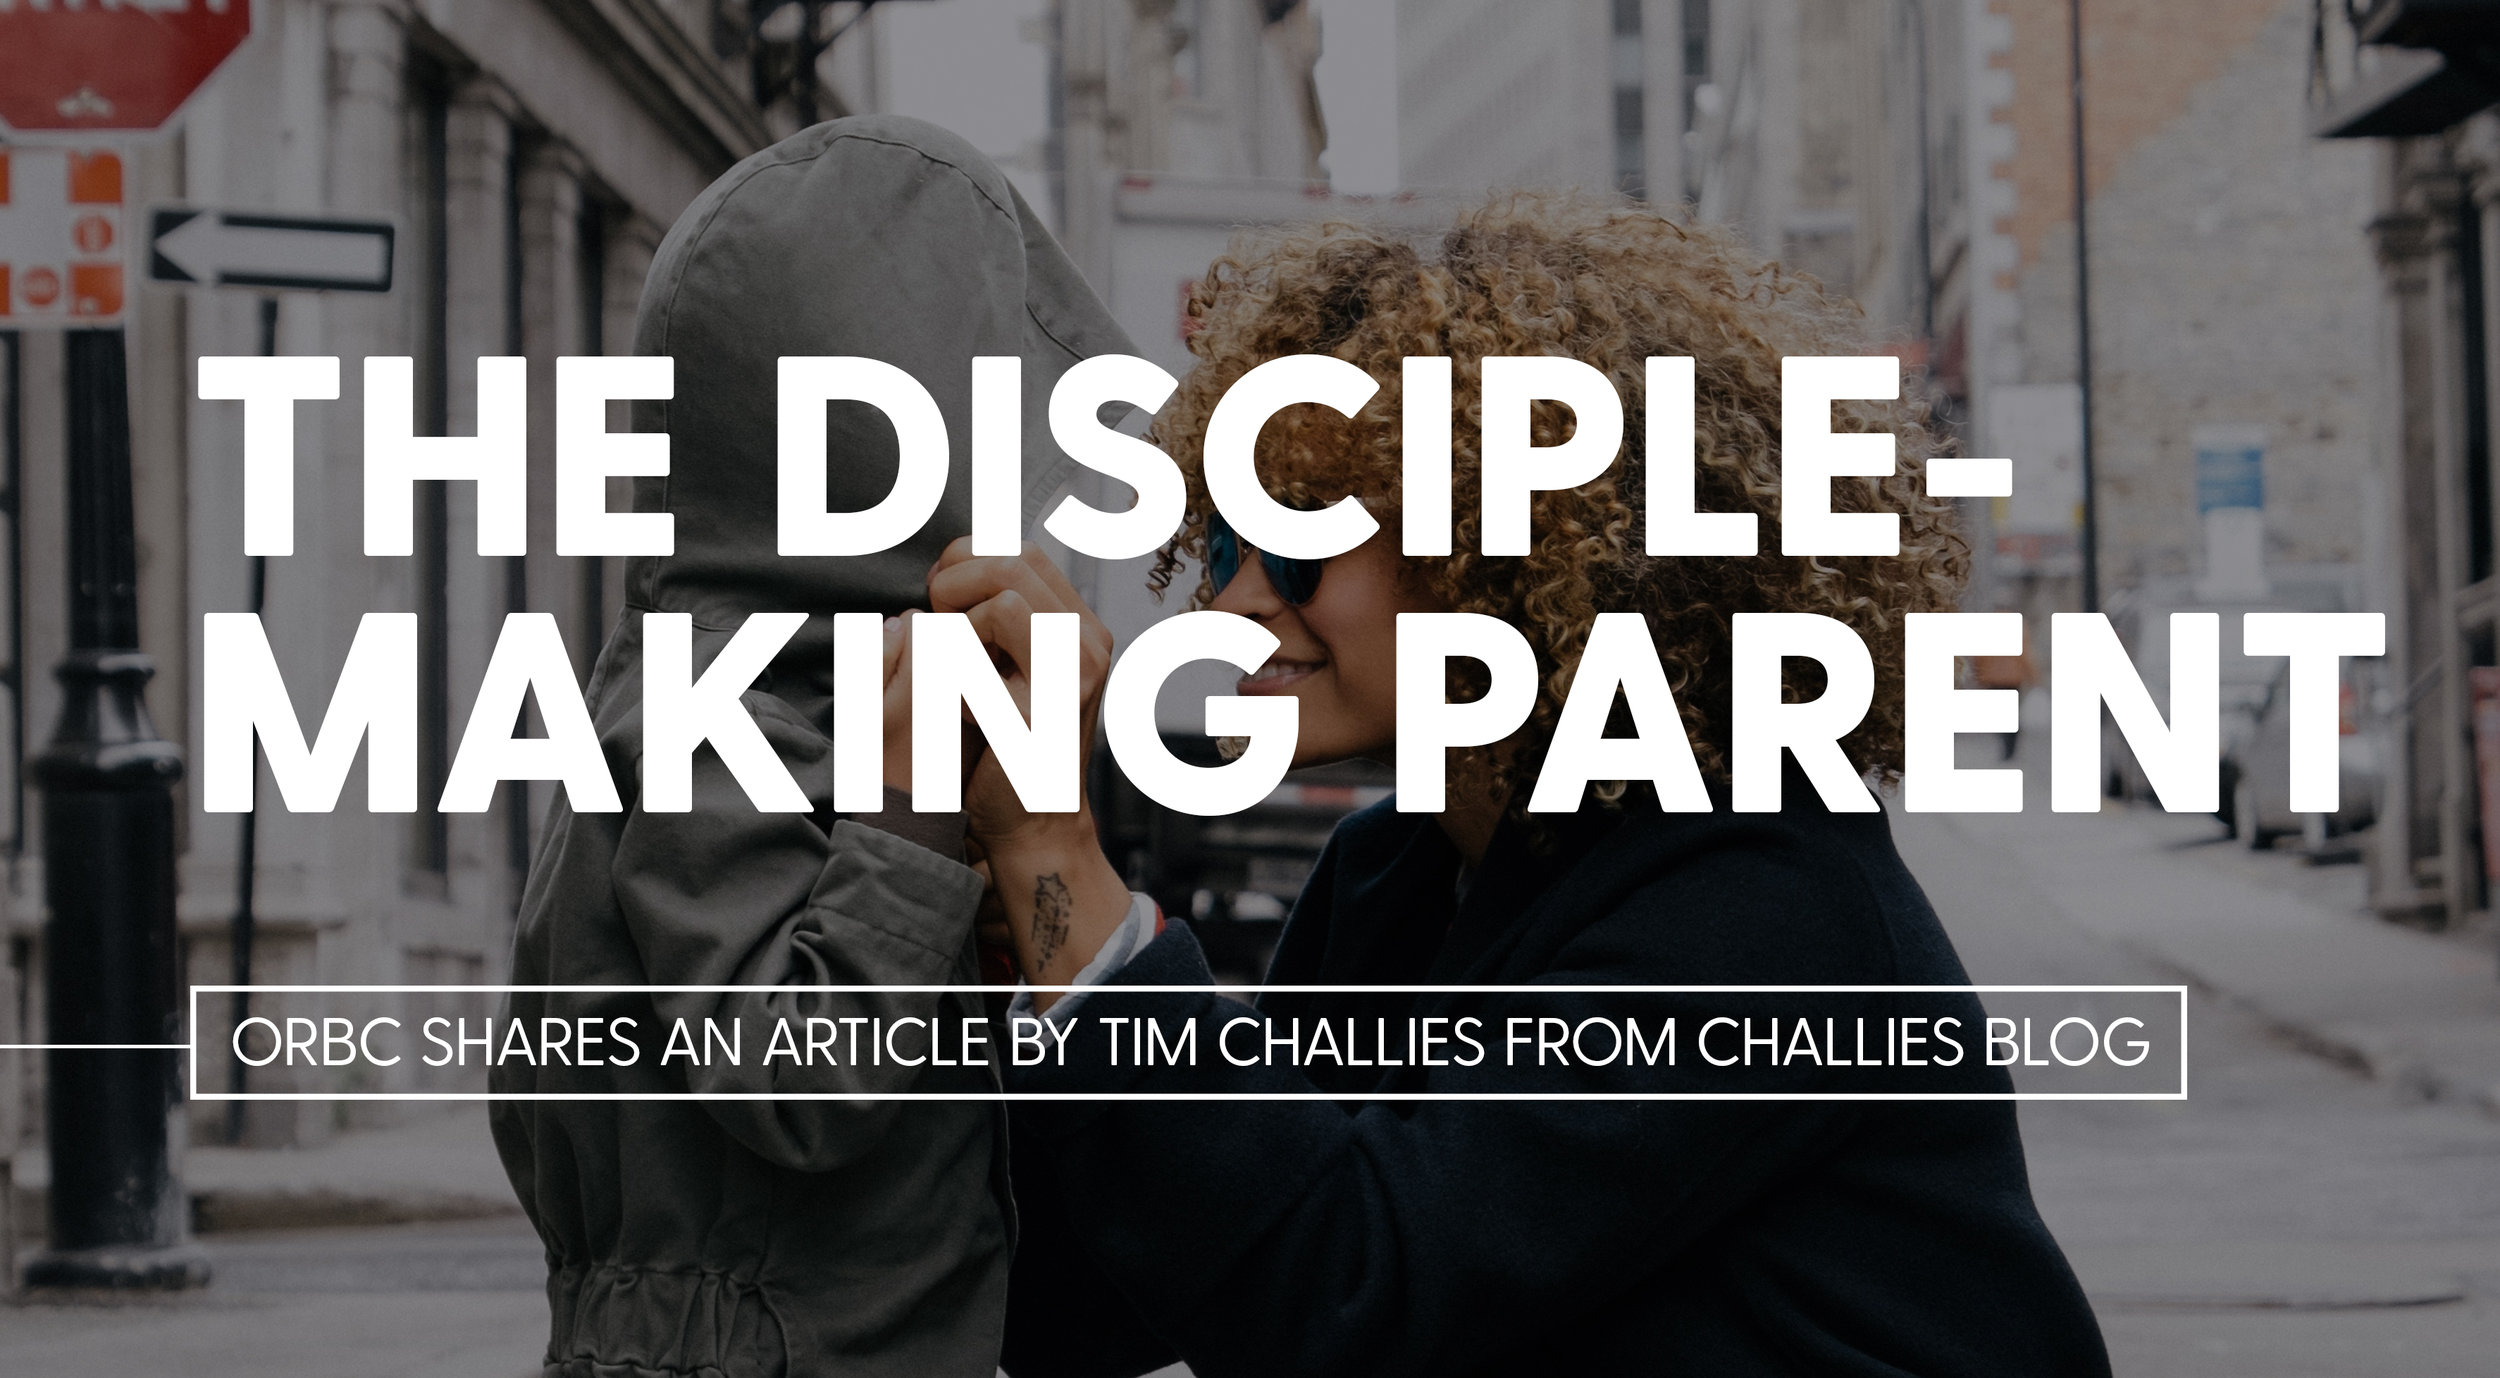 disciplemakingparent.jpg